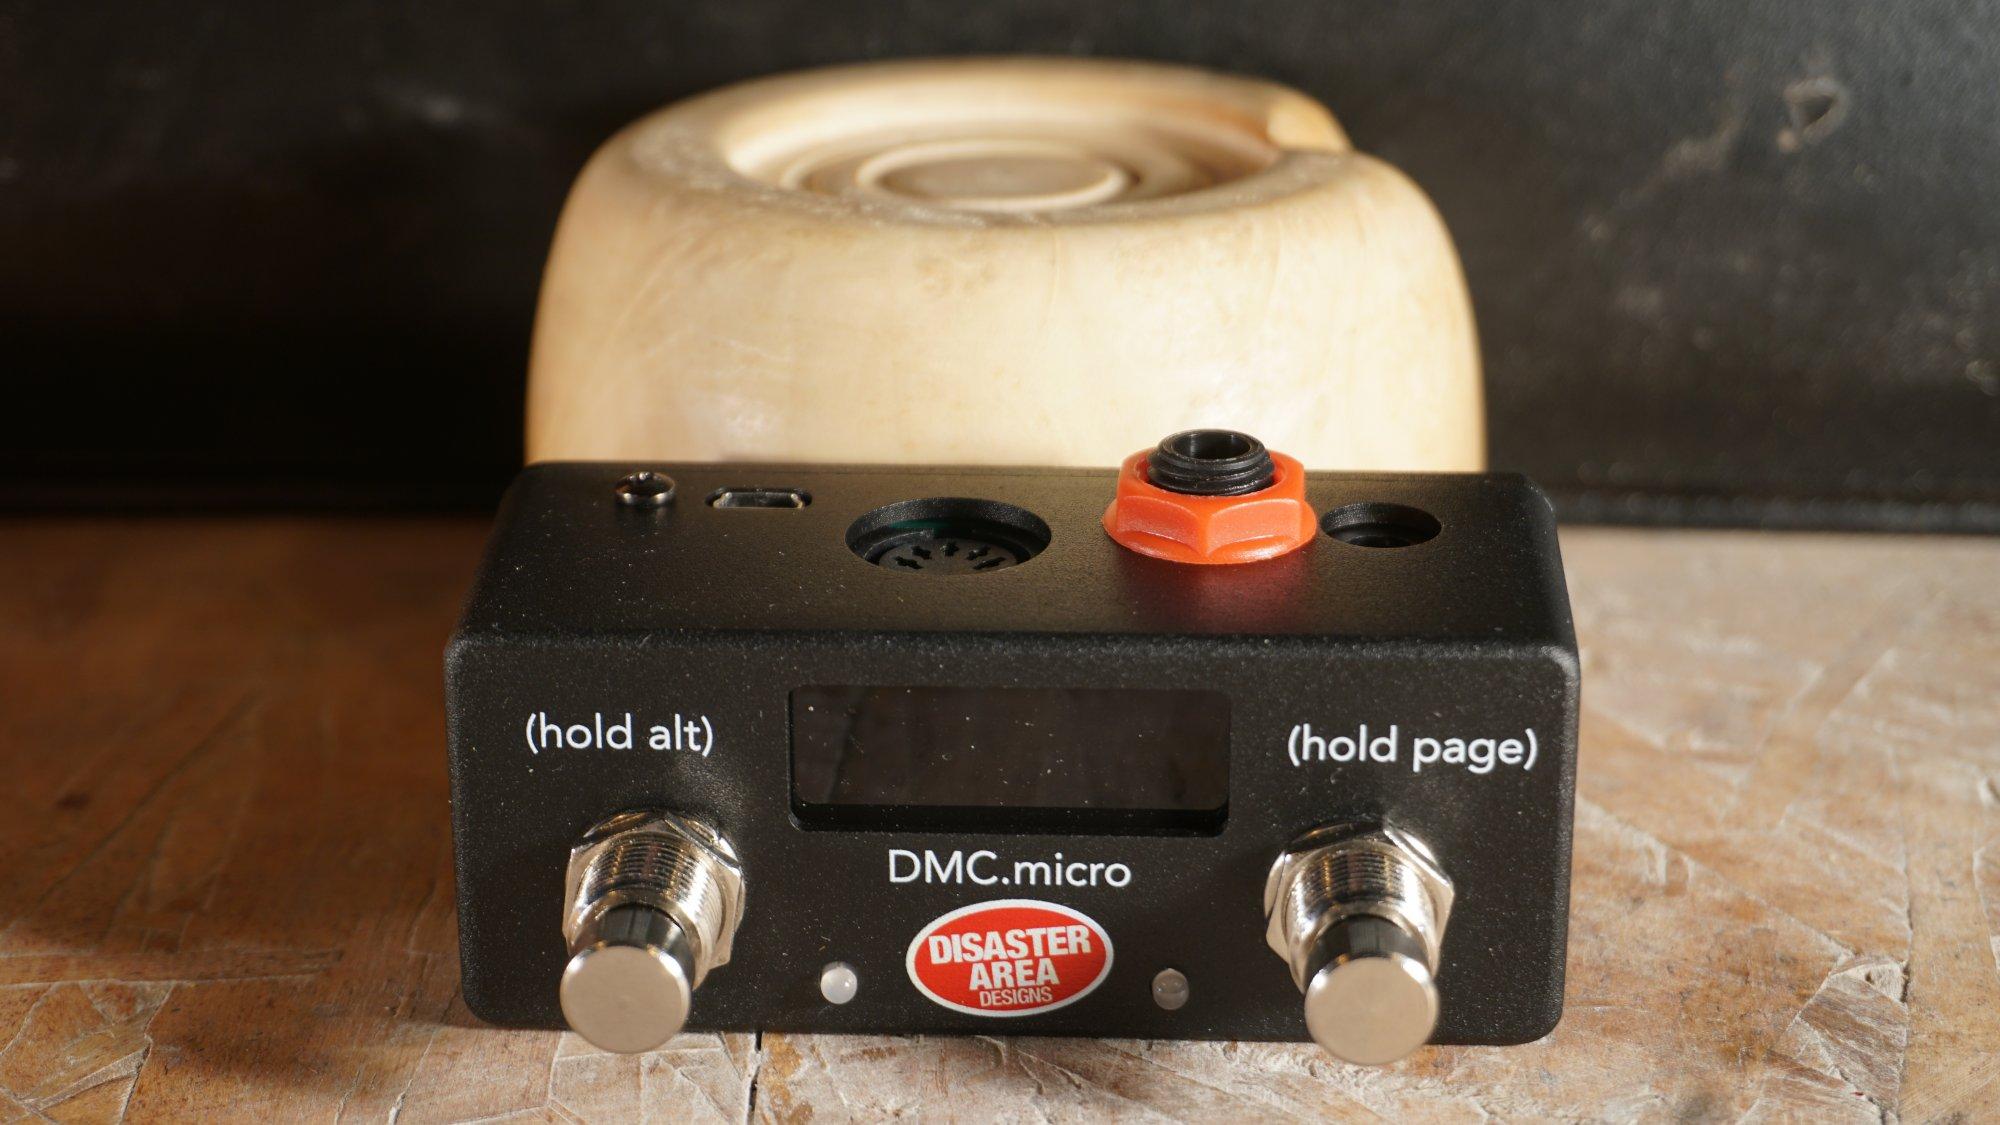 DMC.micro